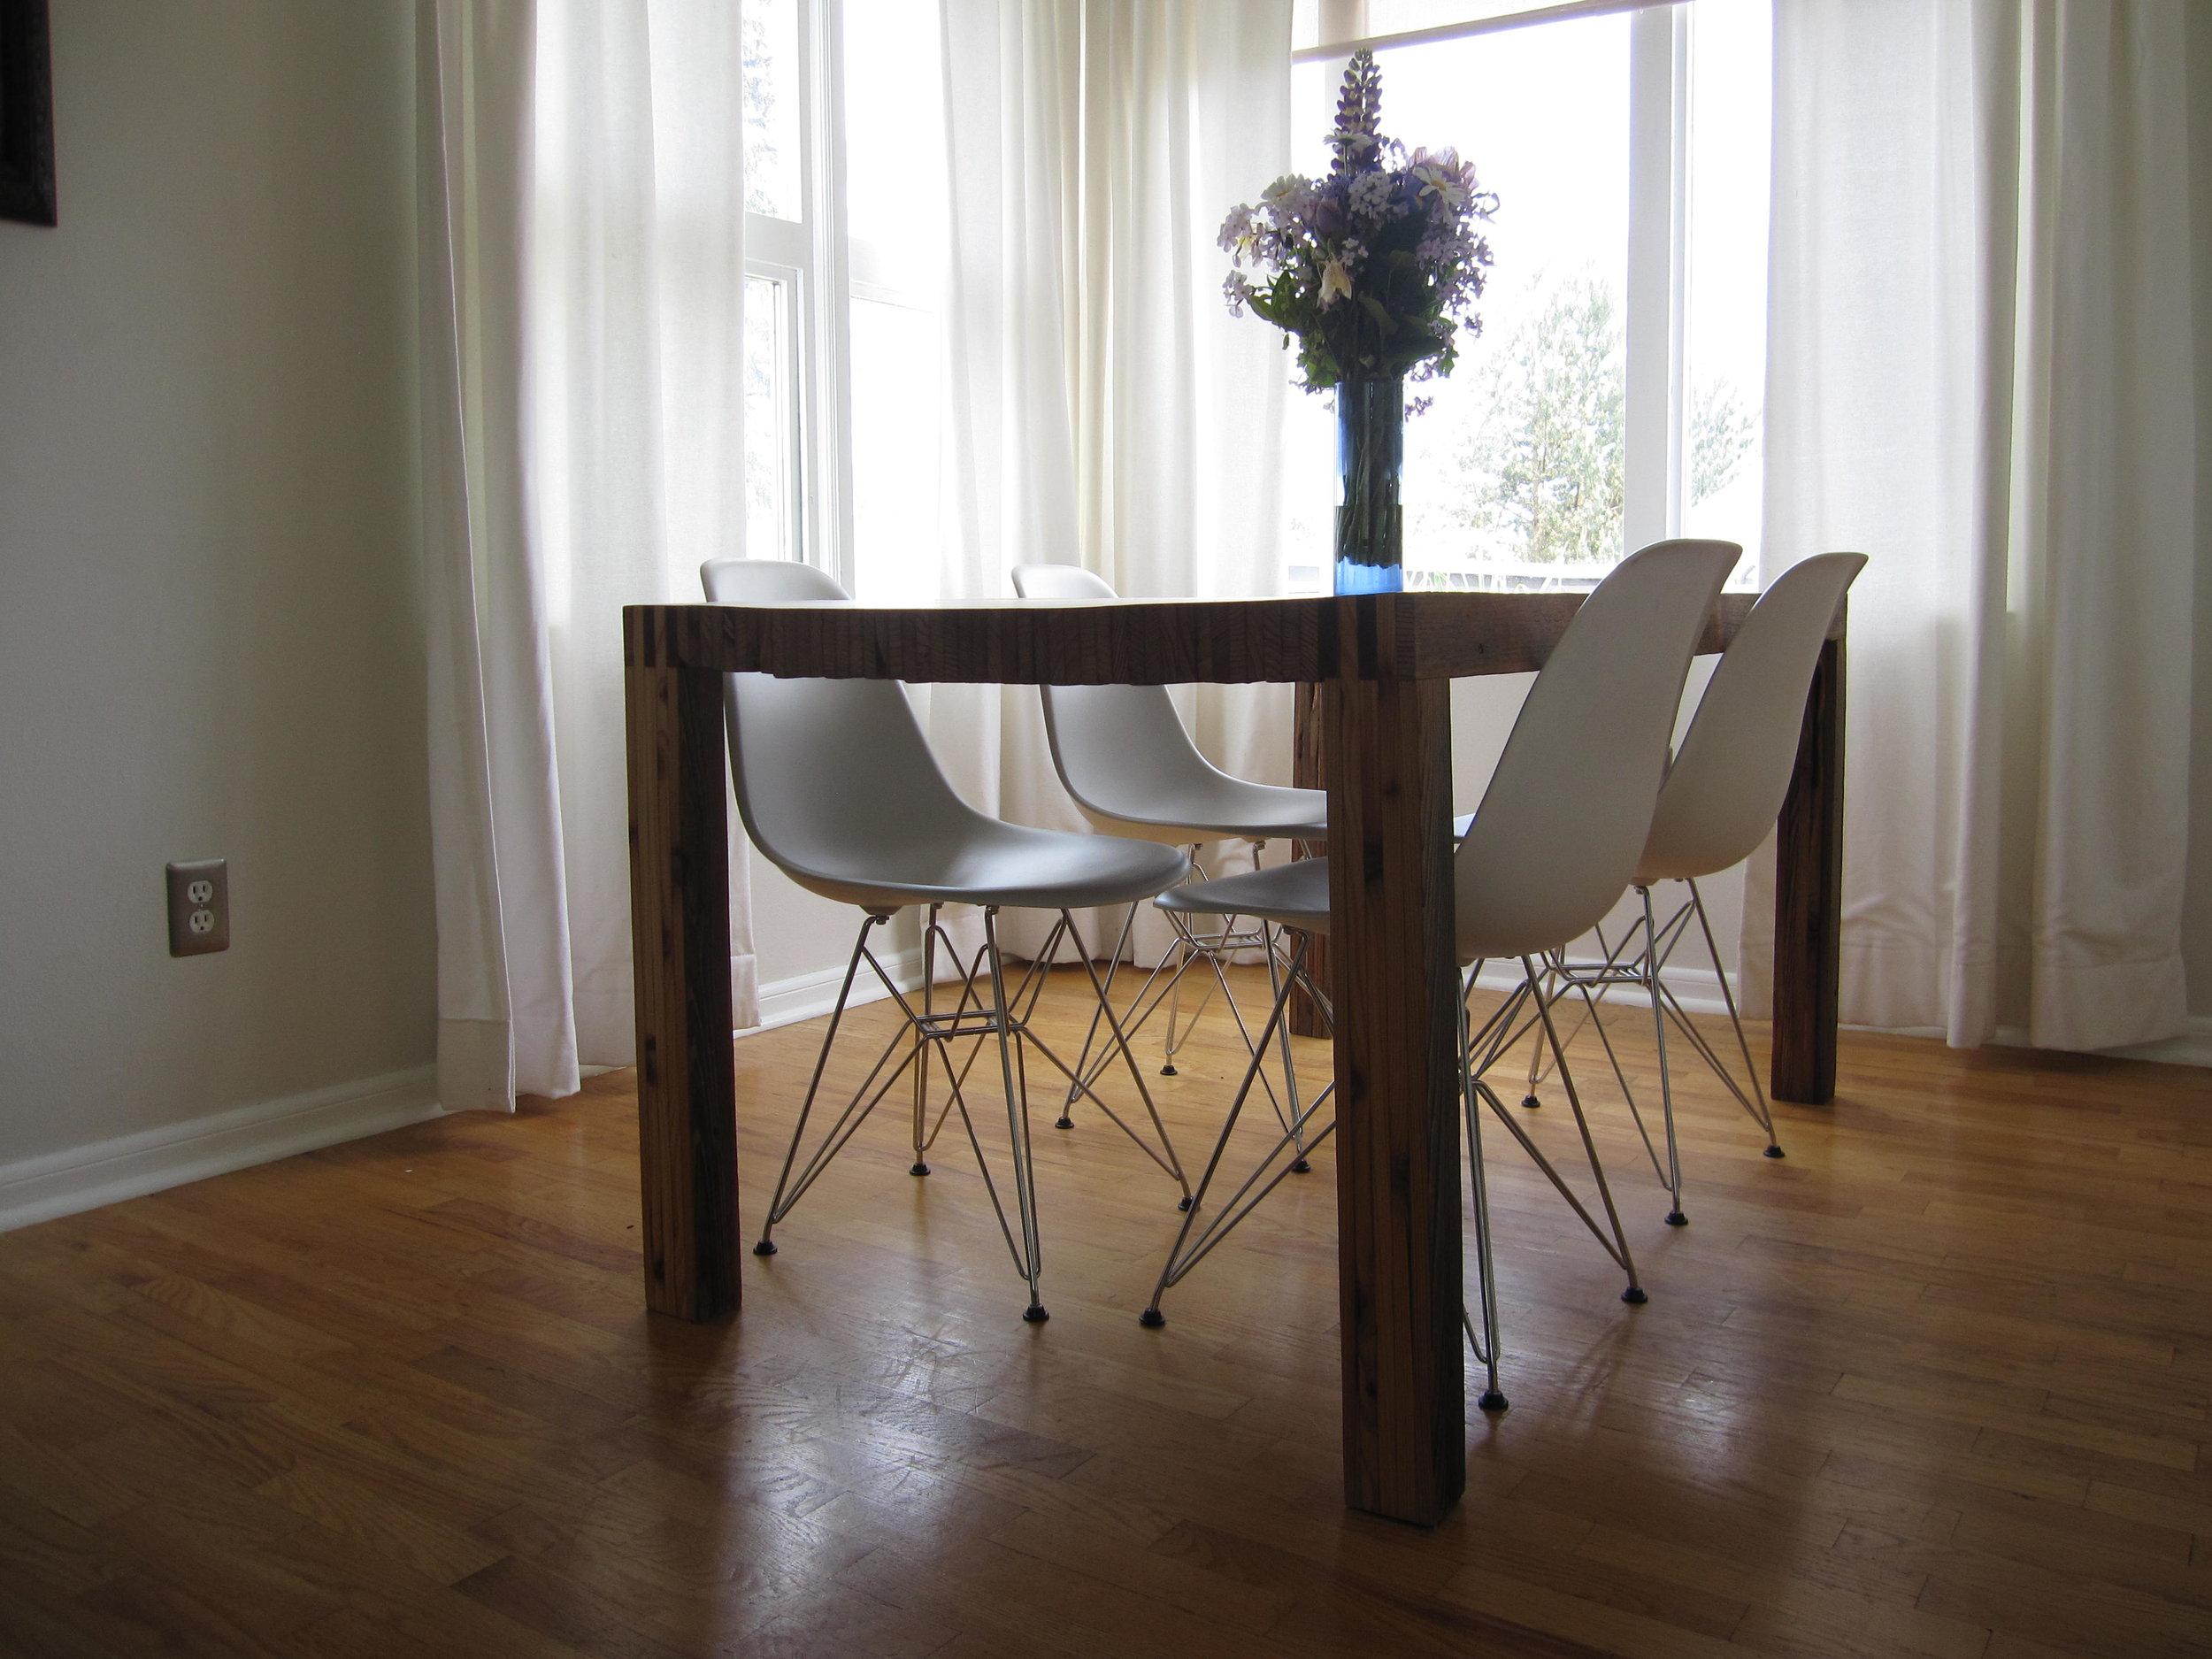 table-in-michael-and-kari-lises-dining-room_7243256652_o.jpg